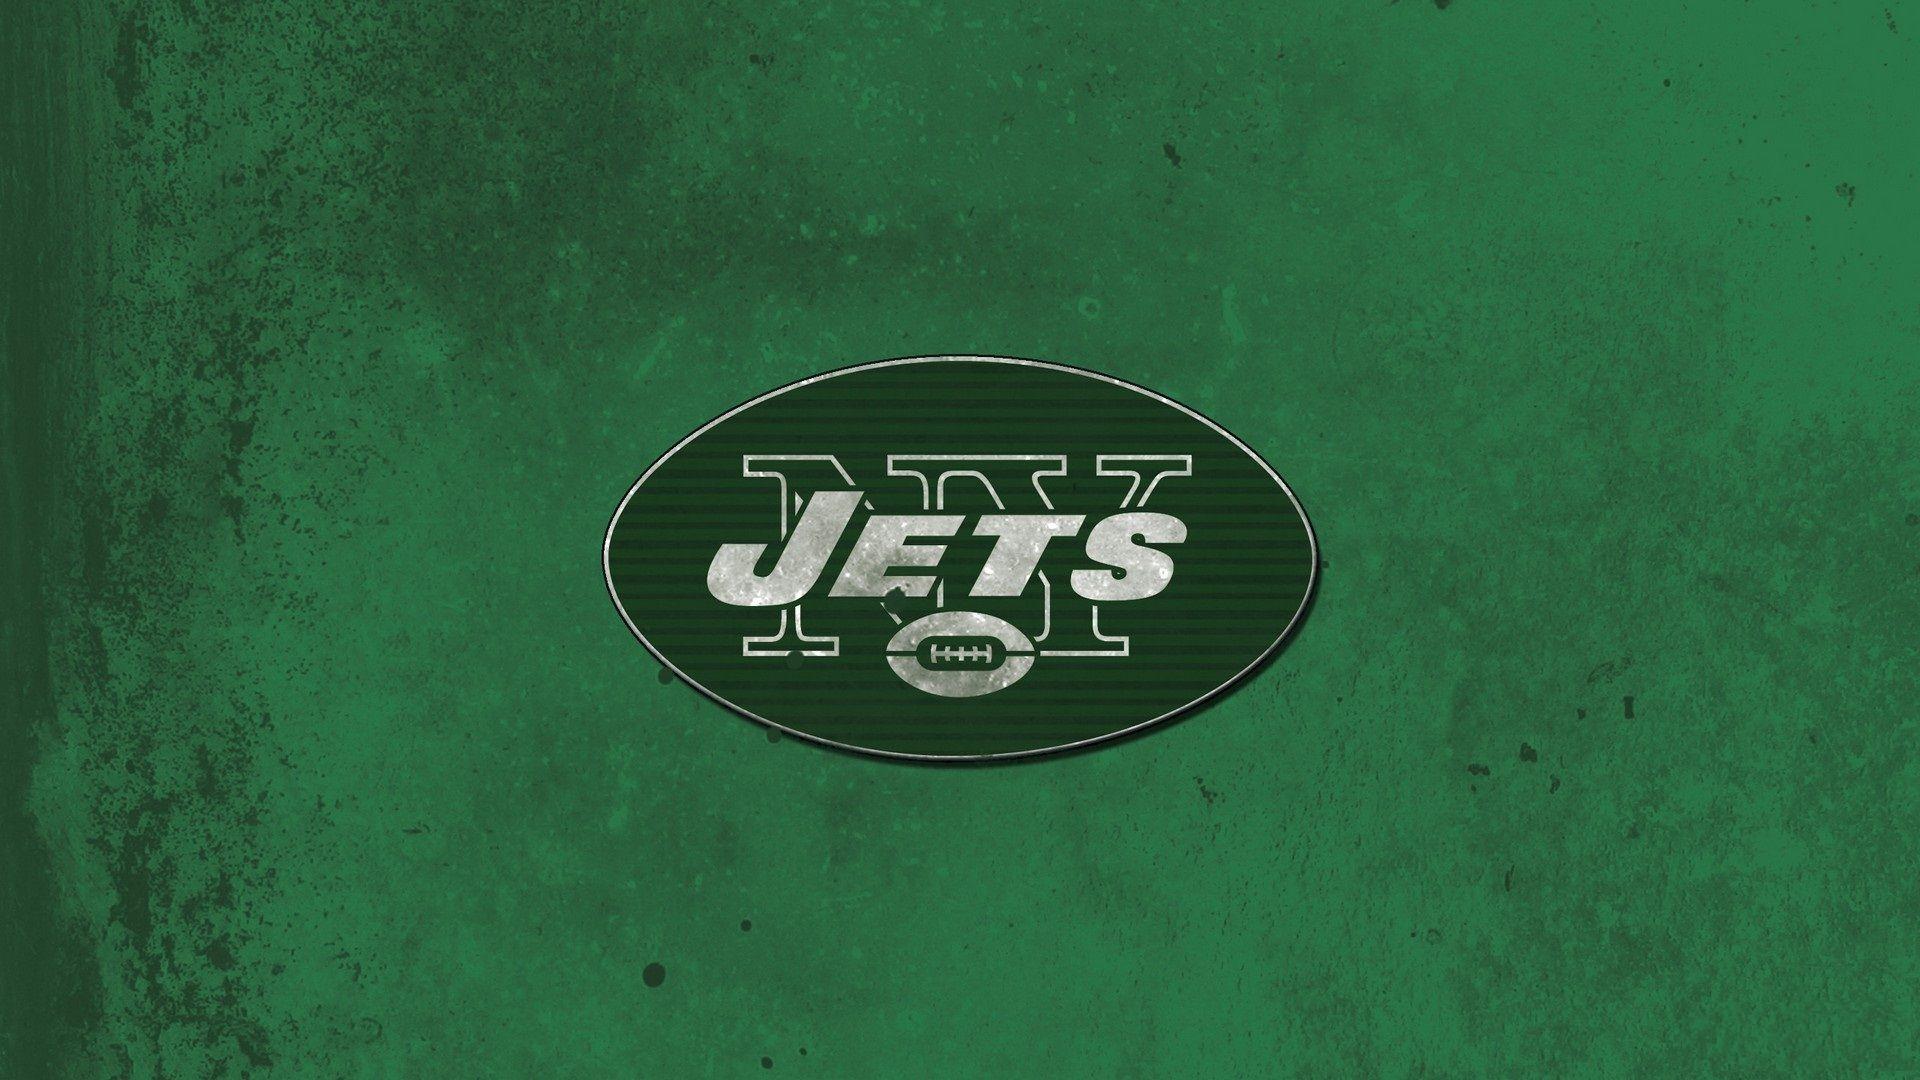 1fc574122 New York Jets Wallpaper HD - 2018